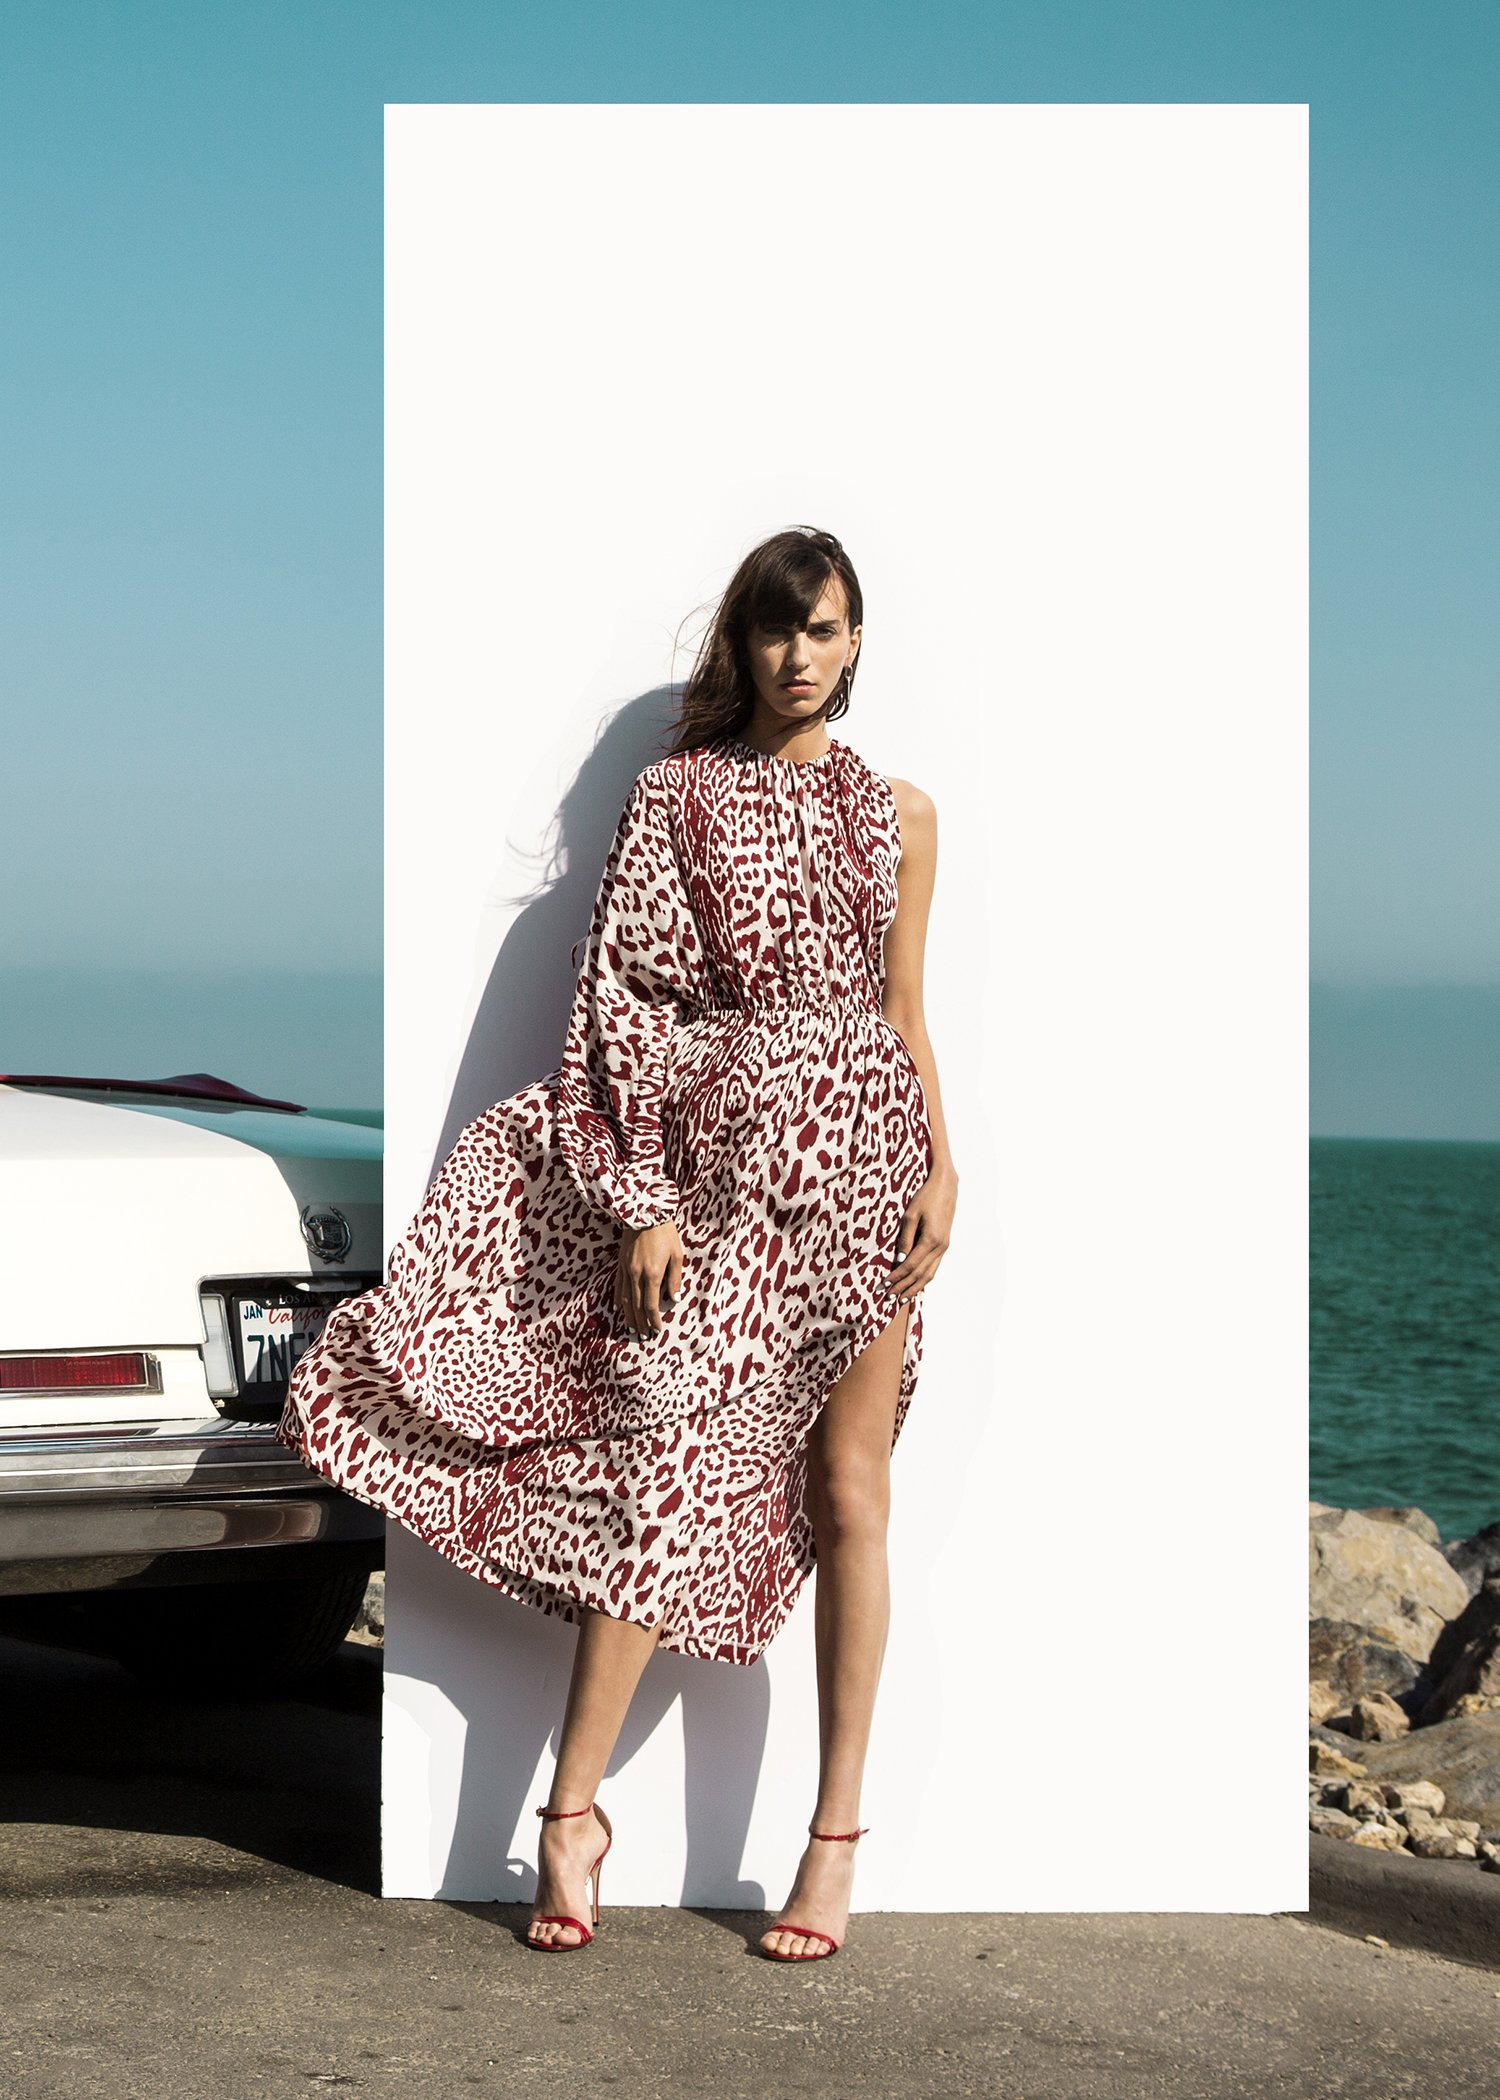 032193ed4937 Robert Rodriguez Studio Women's Fashion Designer Resort 2018 Leopard Print  Silk Dress | #robertrodriguez #leopard